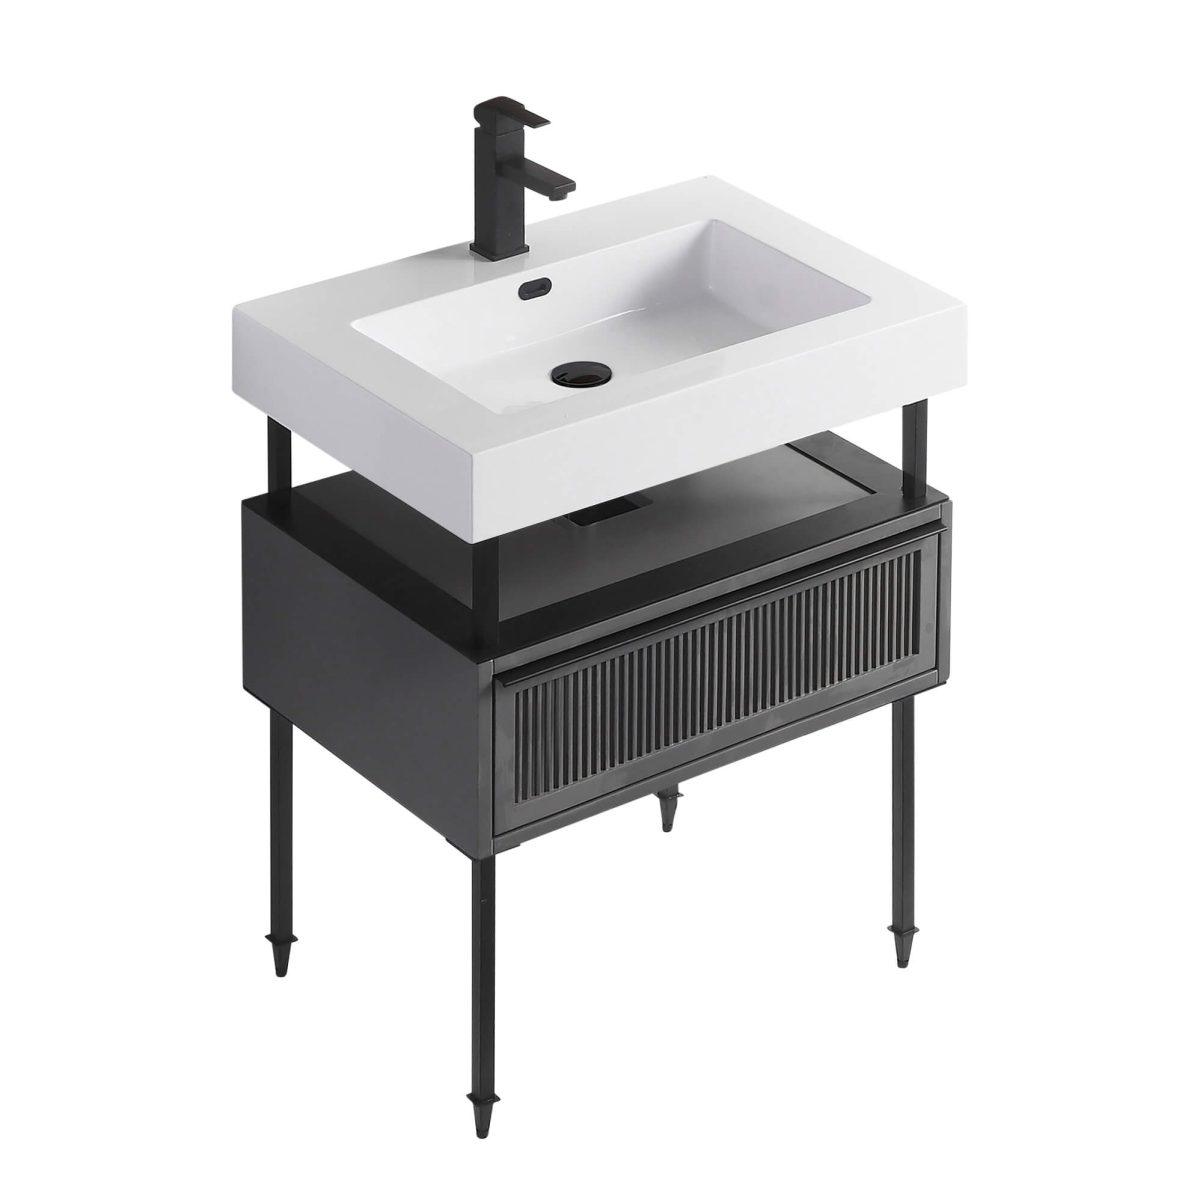 "Dakota 30"" Modern Bathroom Vanity  Rock Gray with Black Hardware"